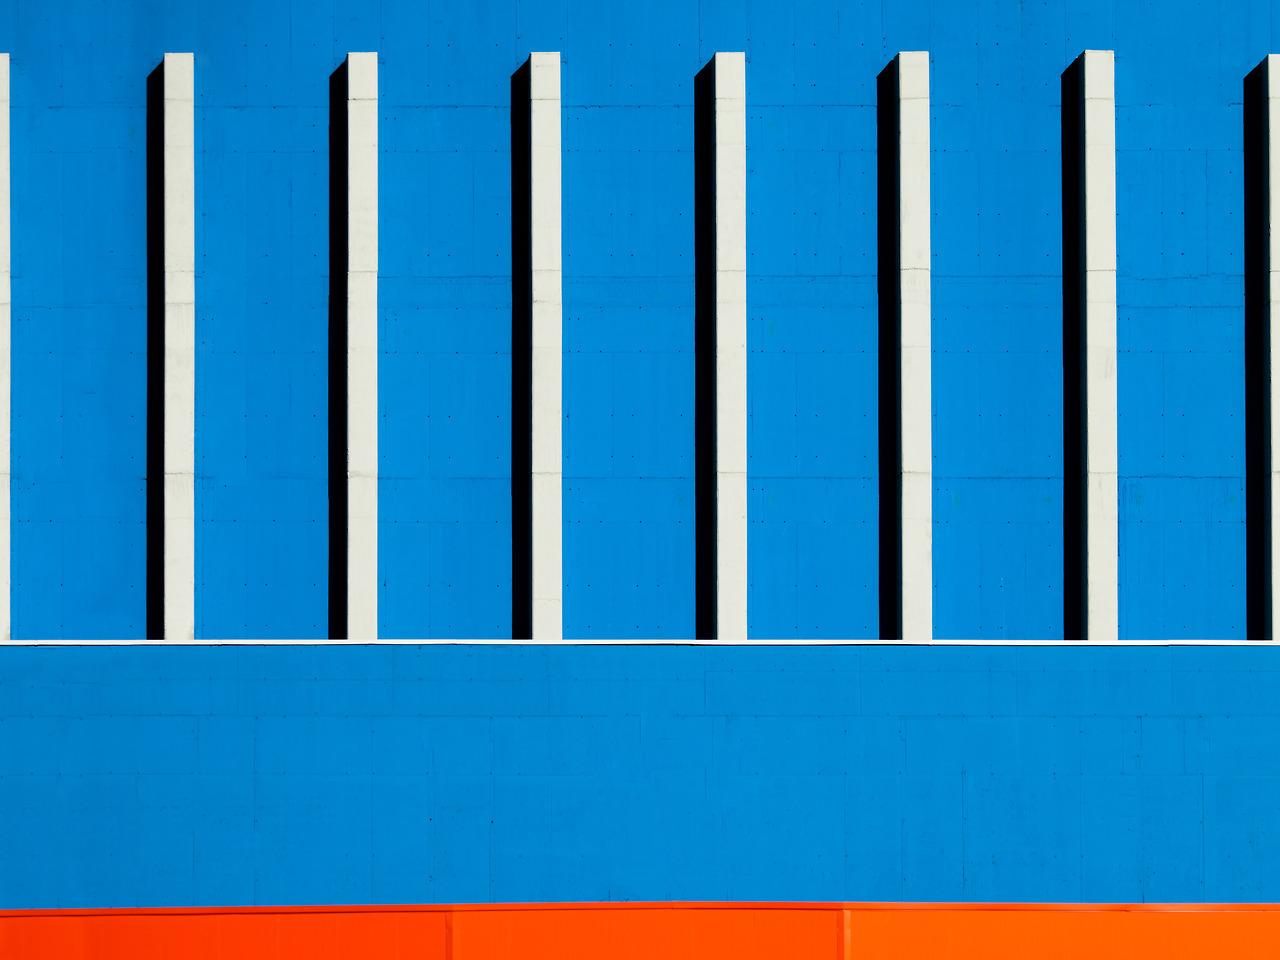 ©Paolo Pettigiani - Geometrie #1. Arquitectura | Fotografía | Photography